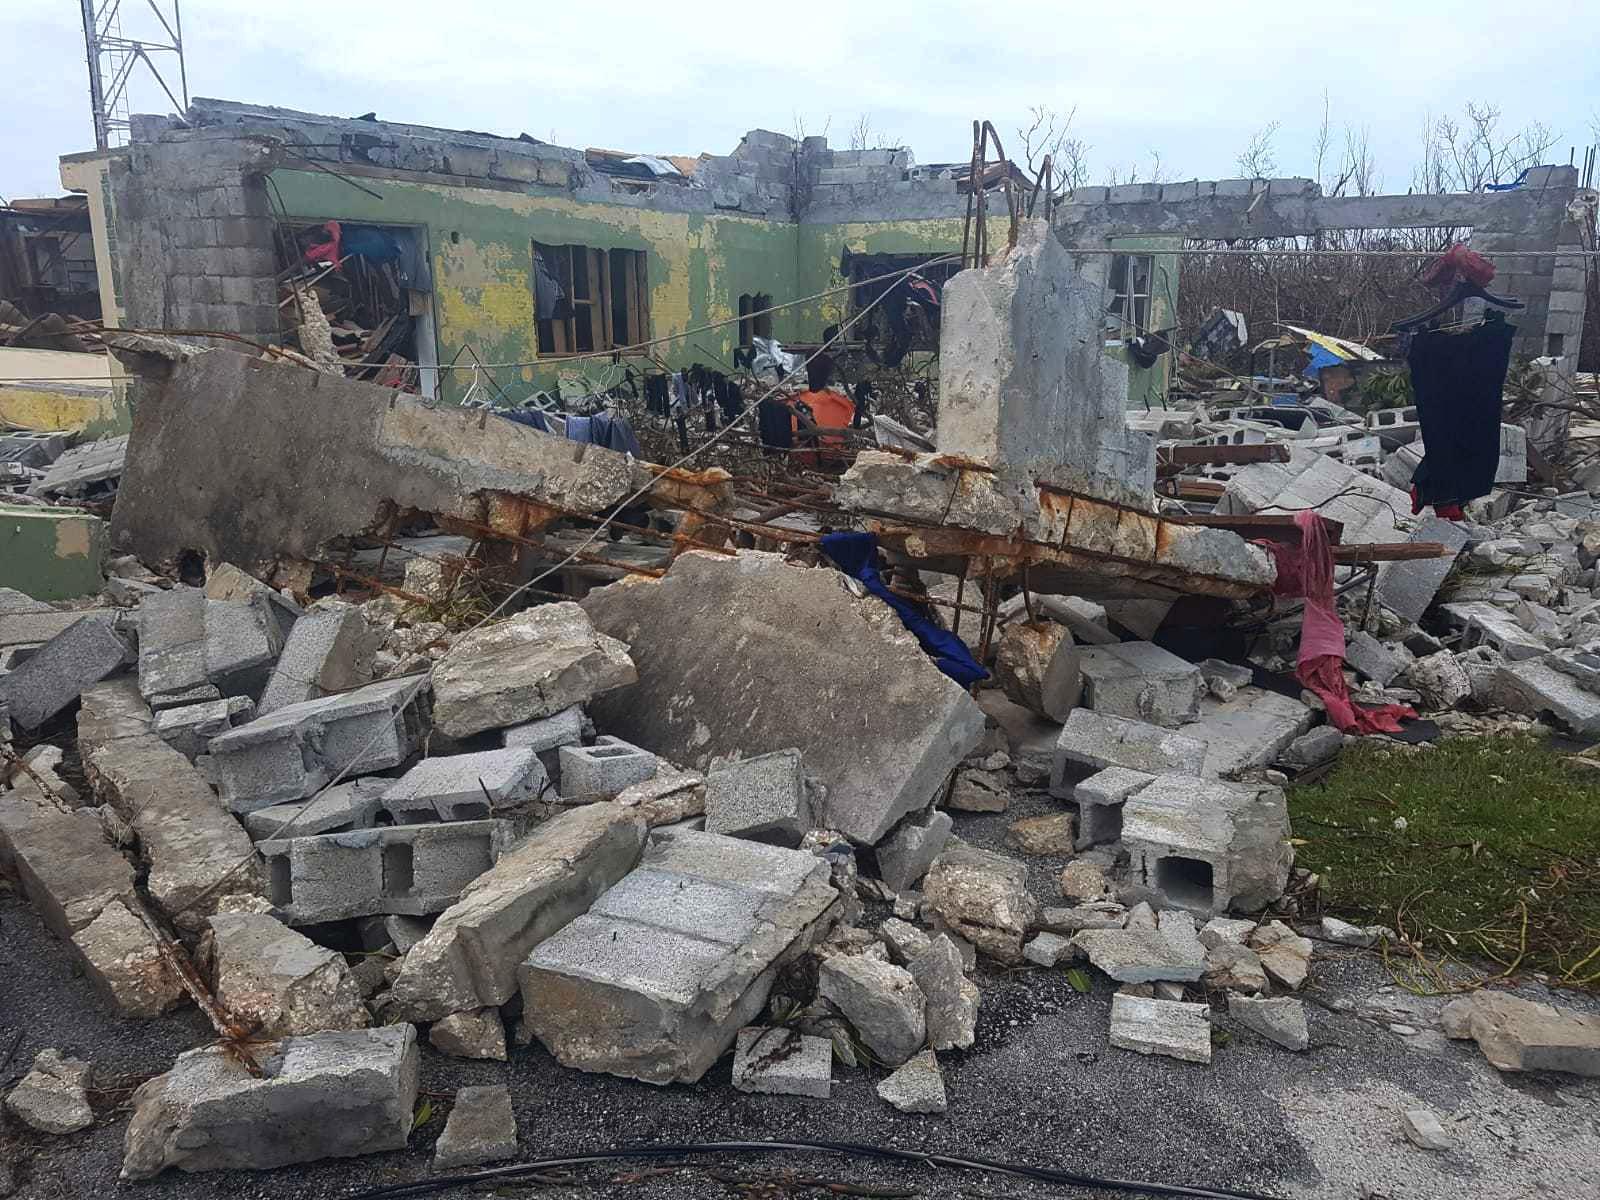 Destruction left by Hurricane Dorian, Sweetings Cay on Grand Bahama Island. Courtesy of HK Team Photos.